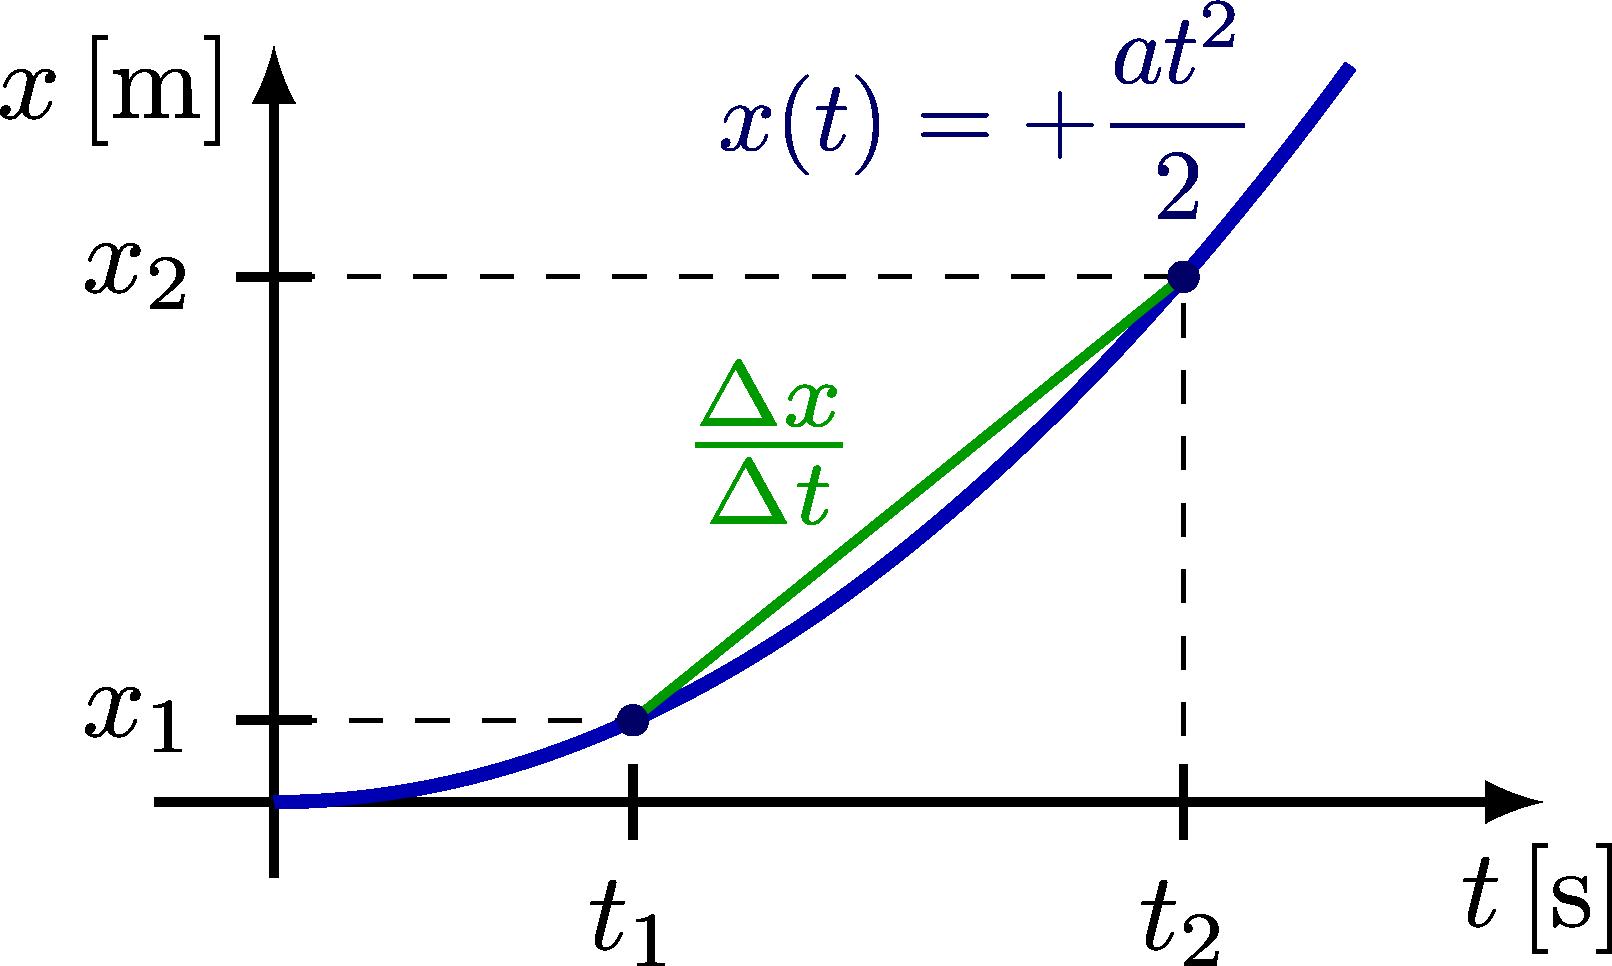 kinematics_curves-003.png